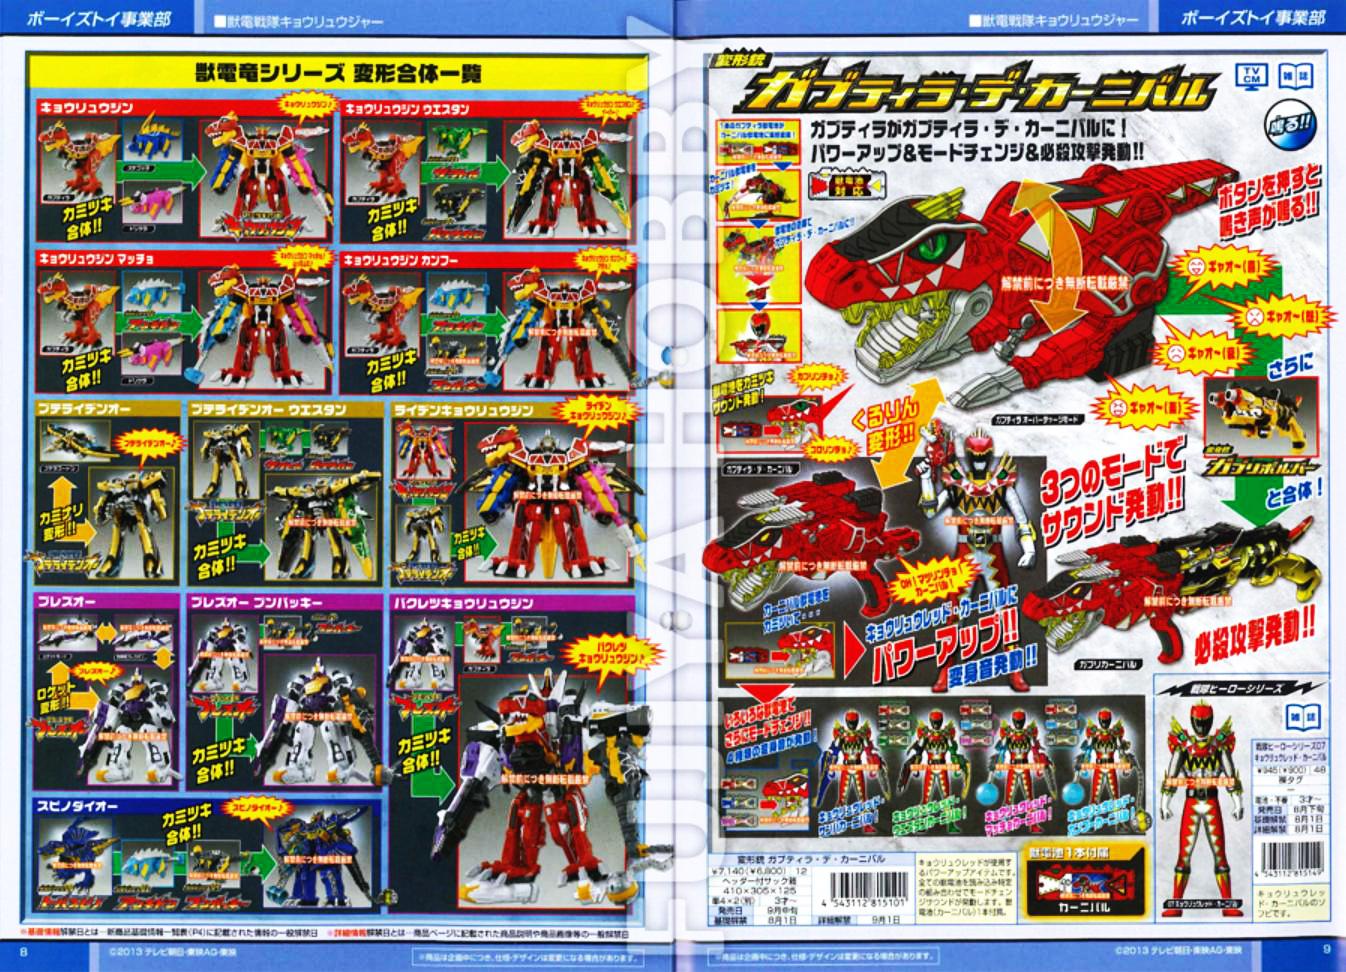 SentaiFive's Tokusatsu Multiverse: New Kyoryuger Catalog ...